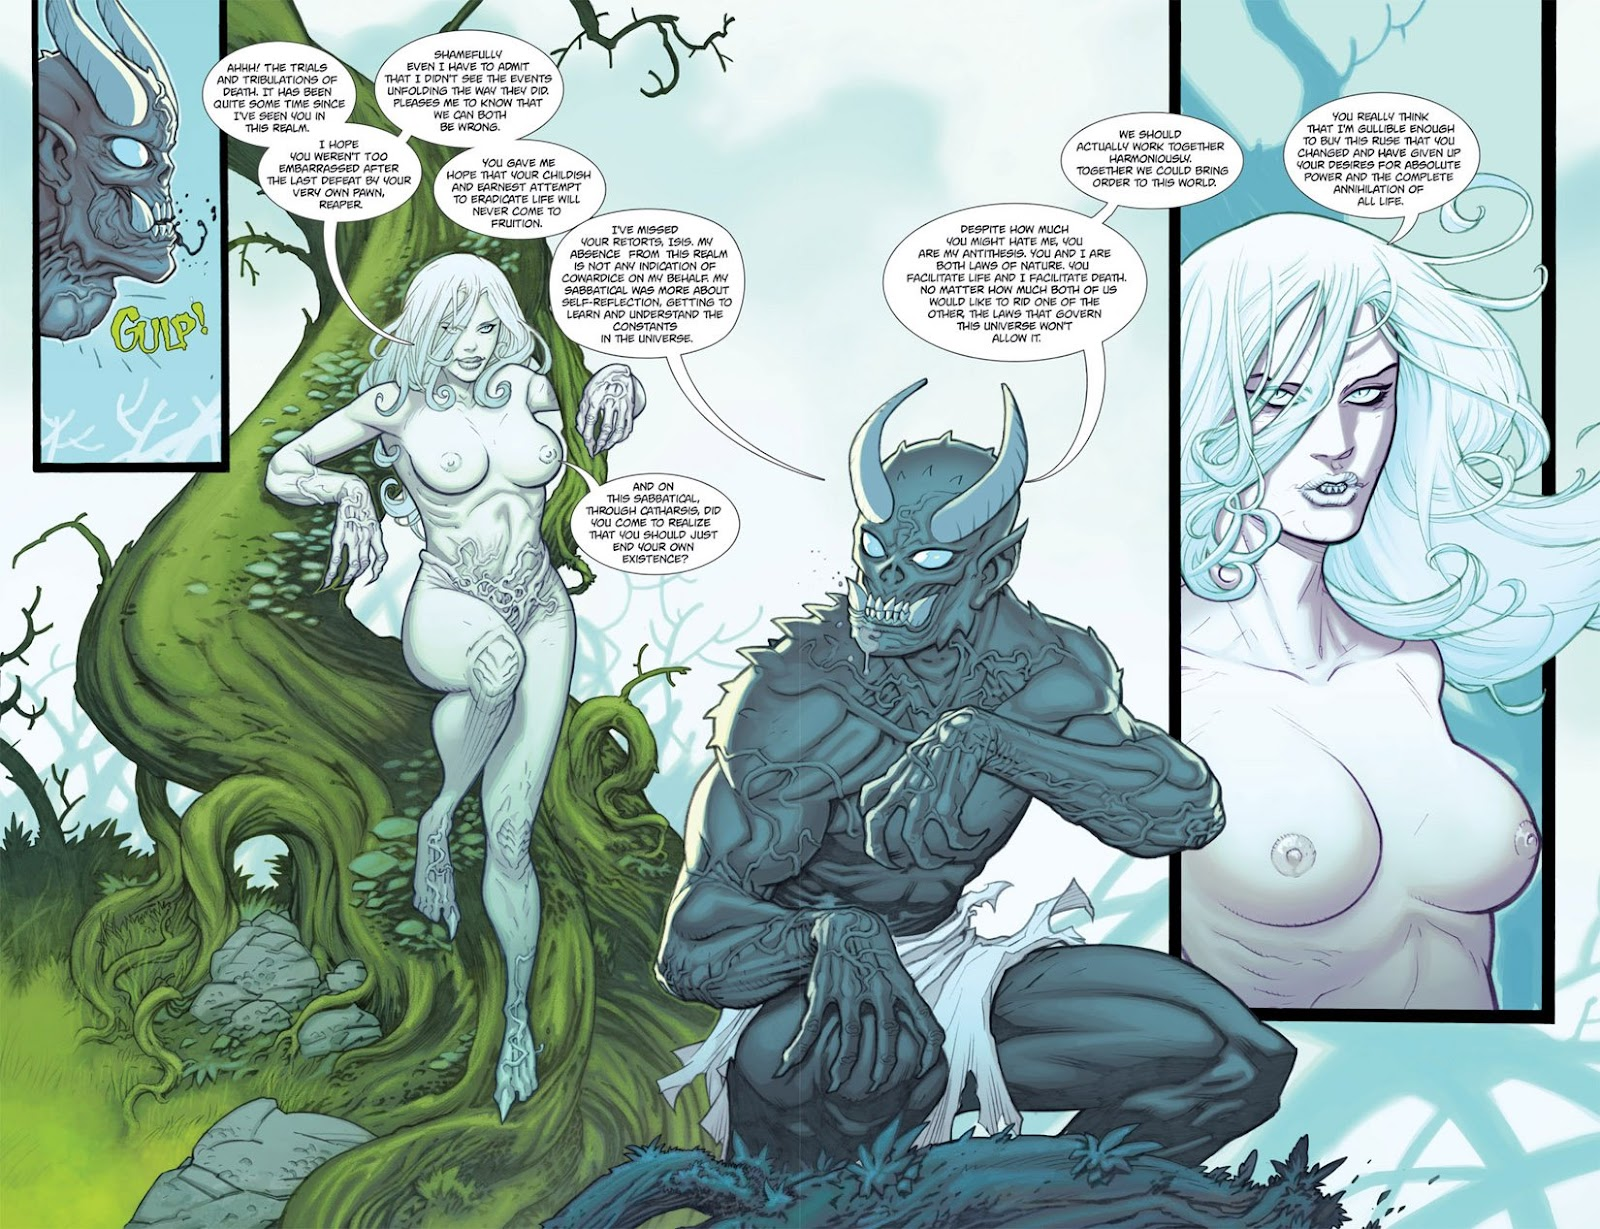 Read online Reaper comic -  Issue #2 - 4